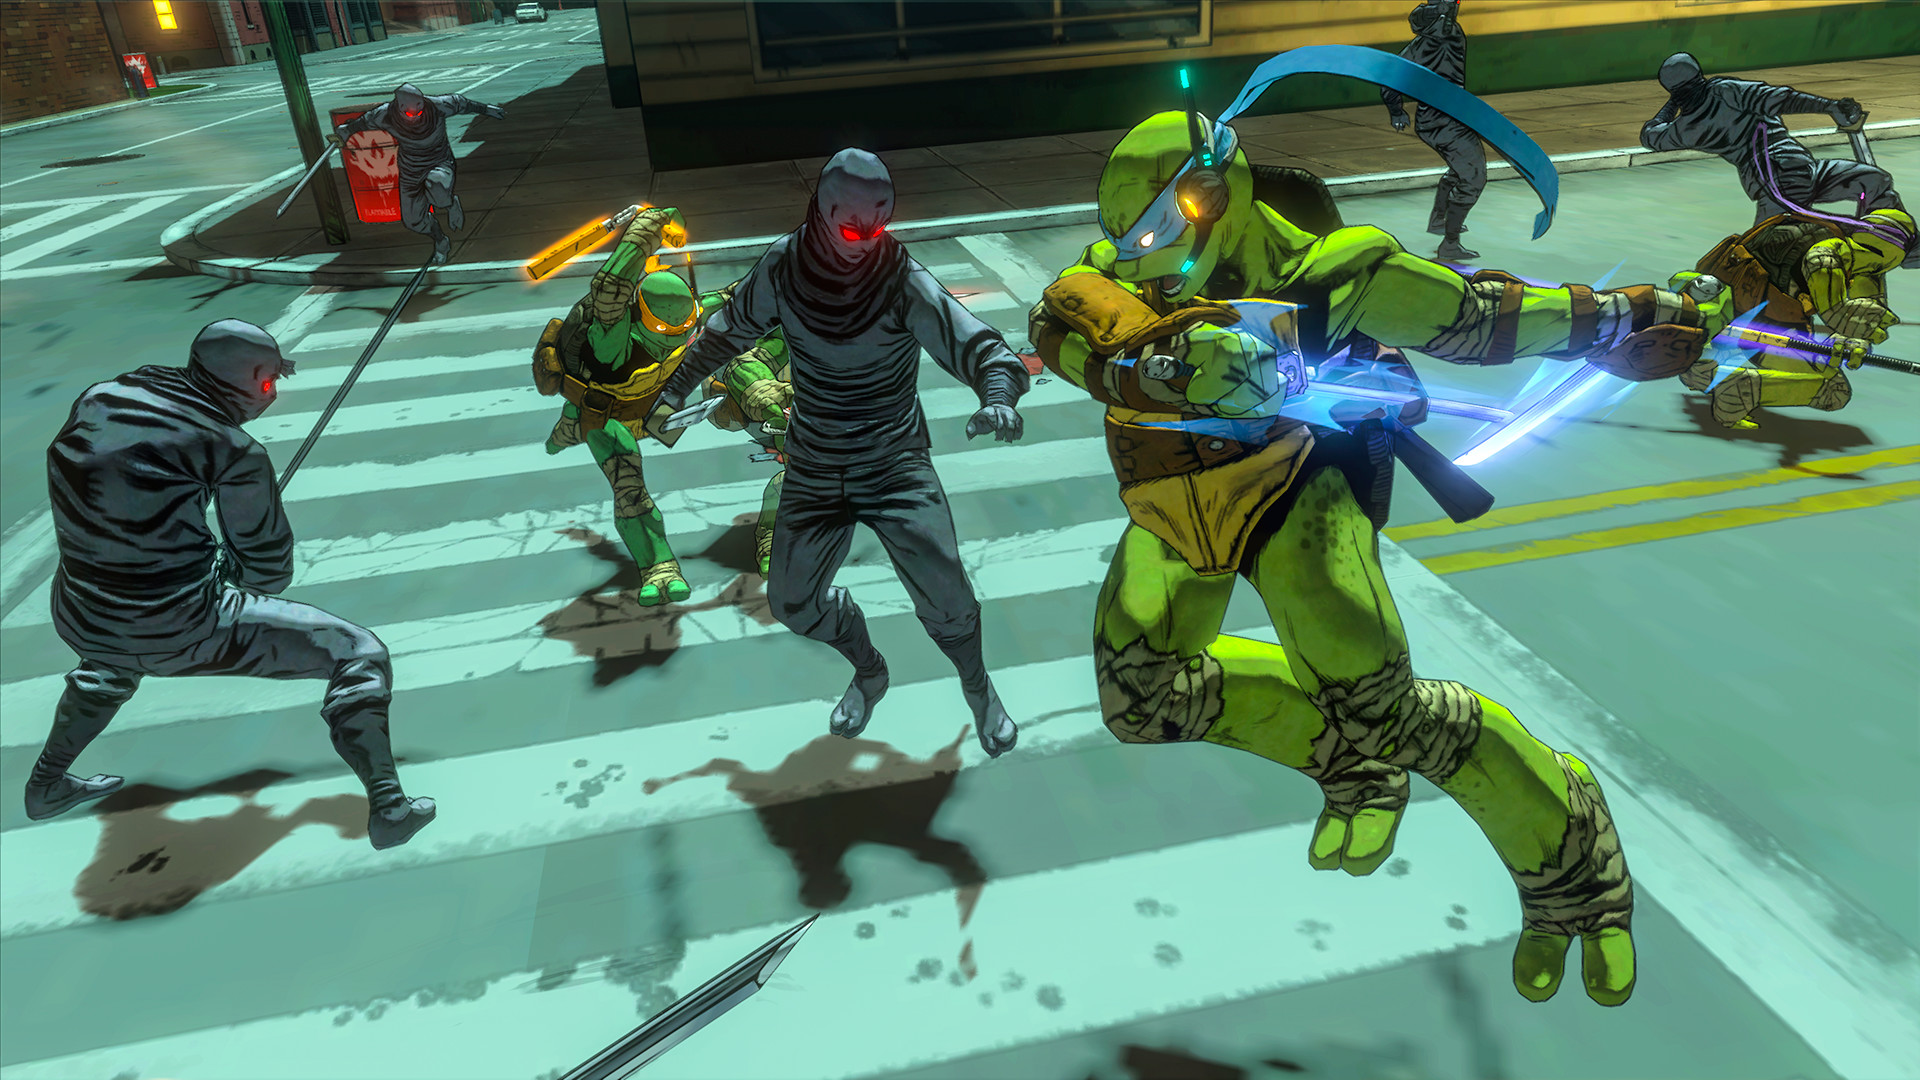 Teenage Mutant Ninja Turtles Mutants In Manhattan ESPAÑOL PC Full (CODEX) + REPACK 2 DVD5 (JPW) 8